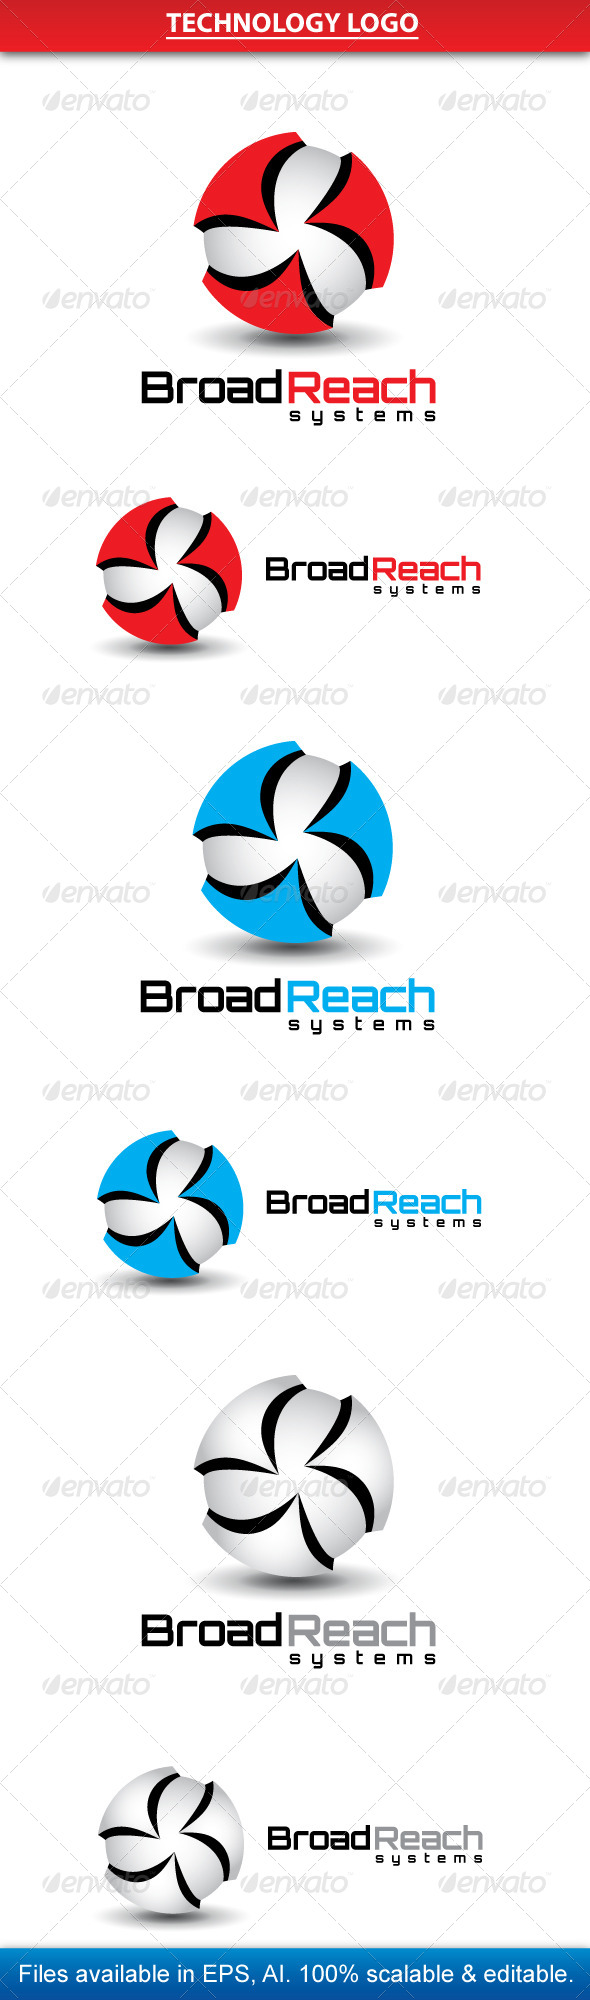 GraphicRiver Technology Logo 3891856